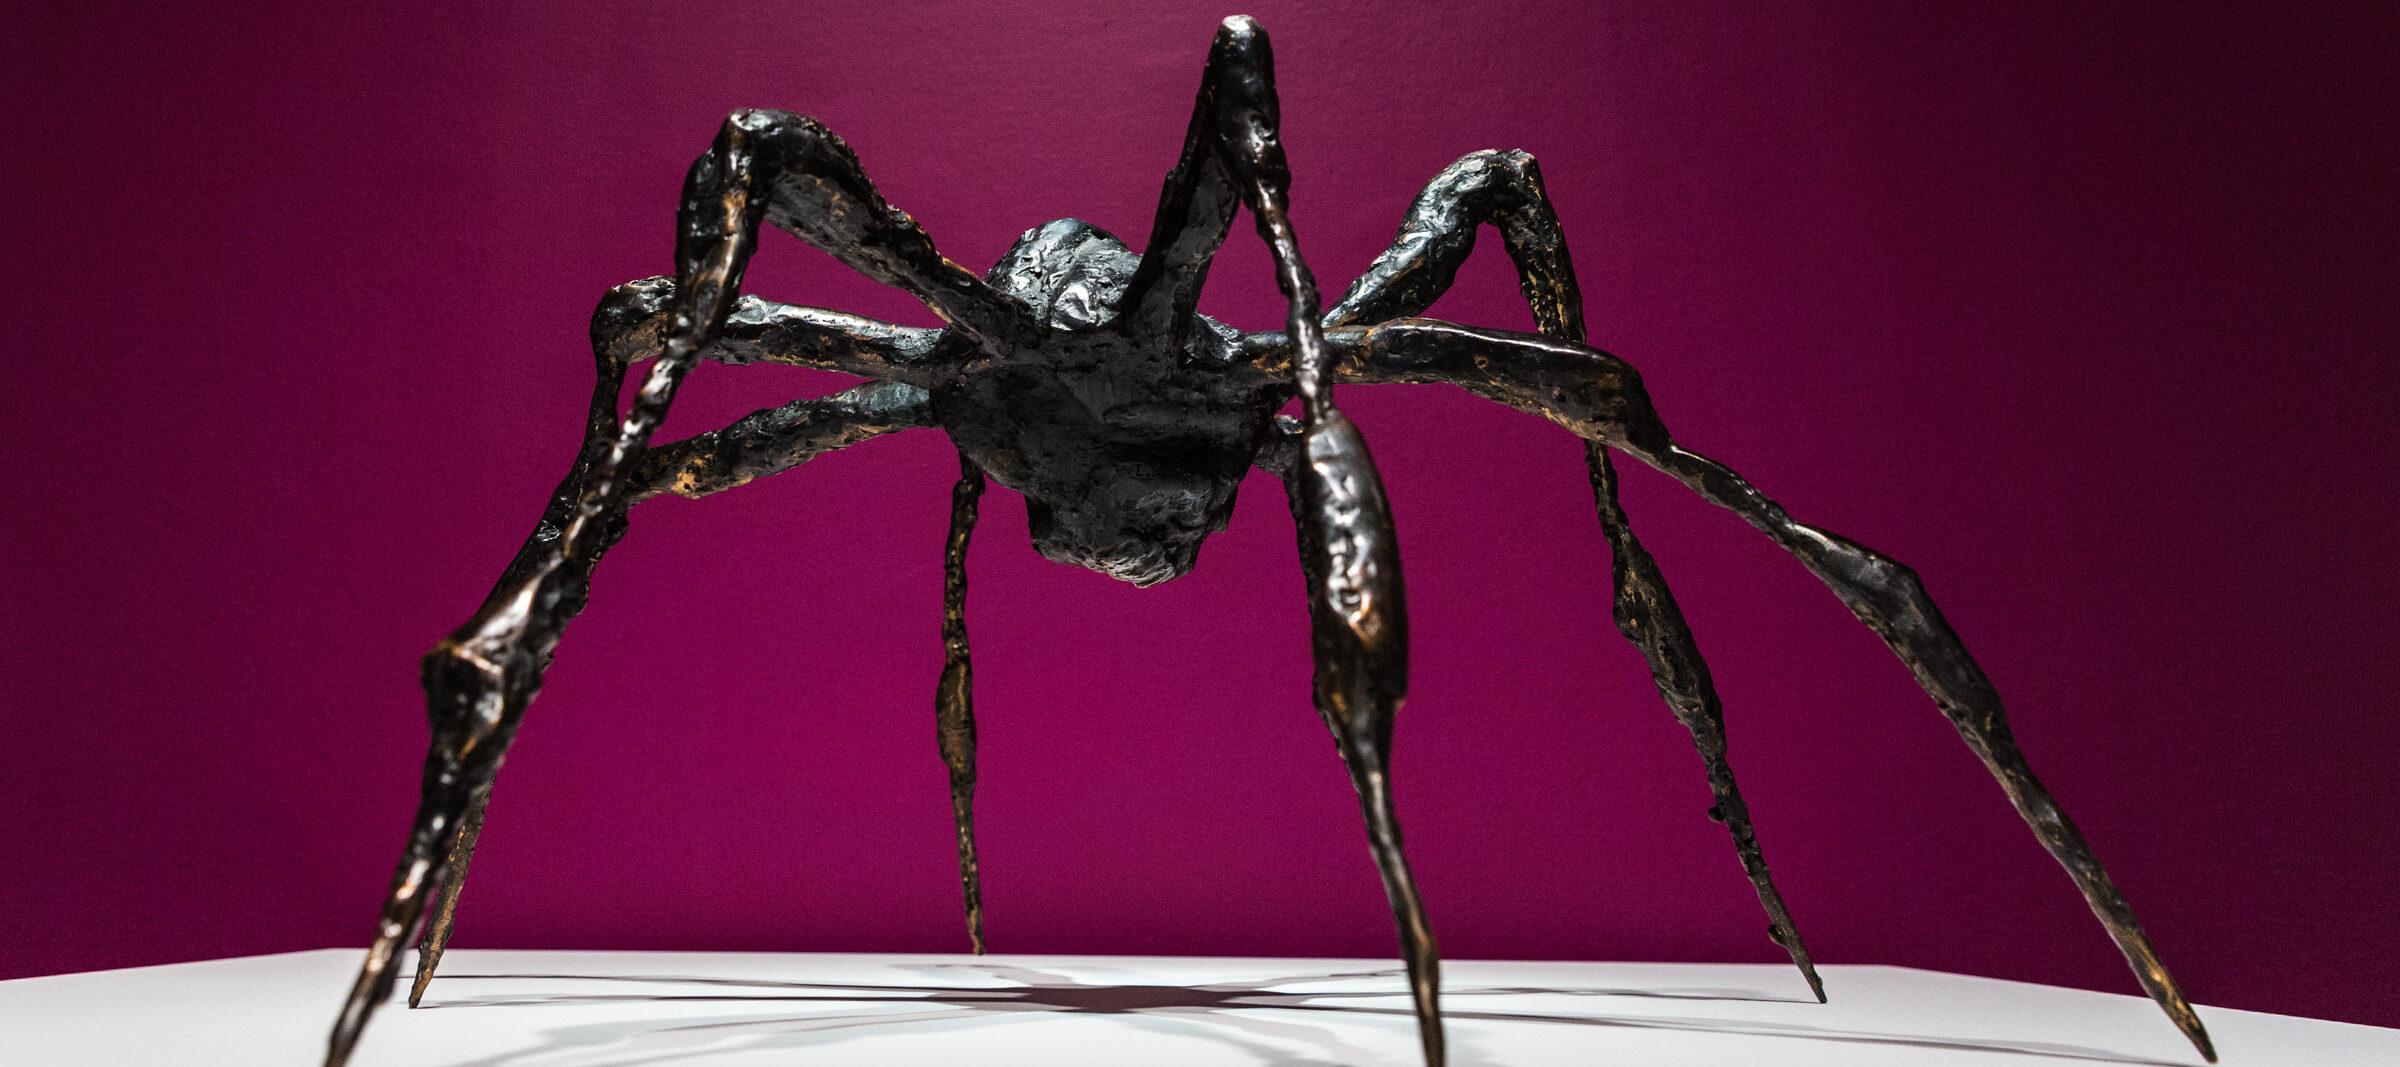 Bronze sculpture of a spider on a white platform against a magenta background.